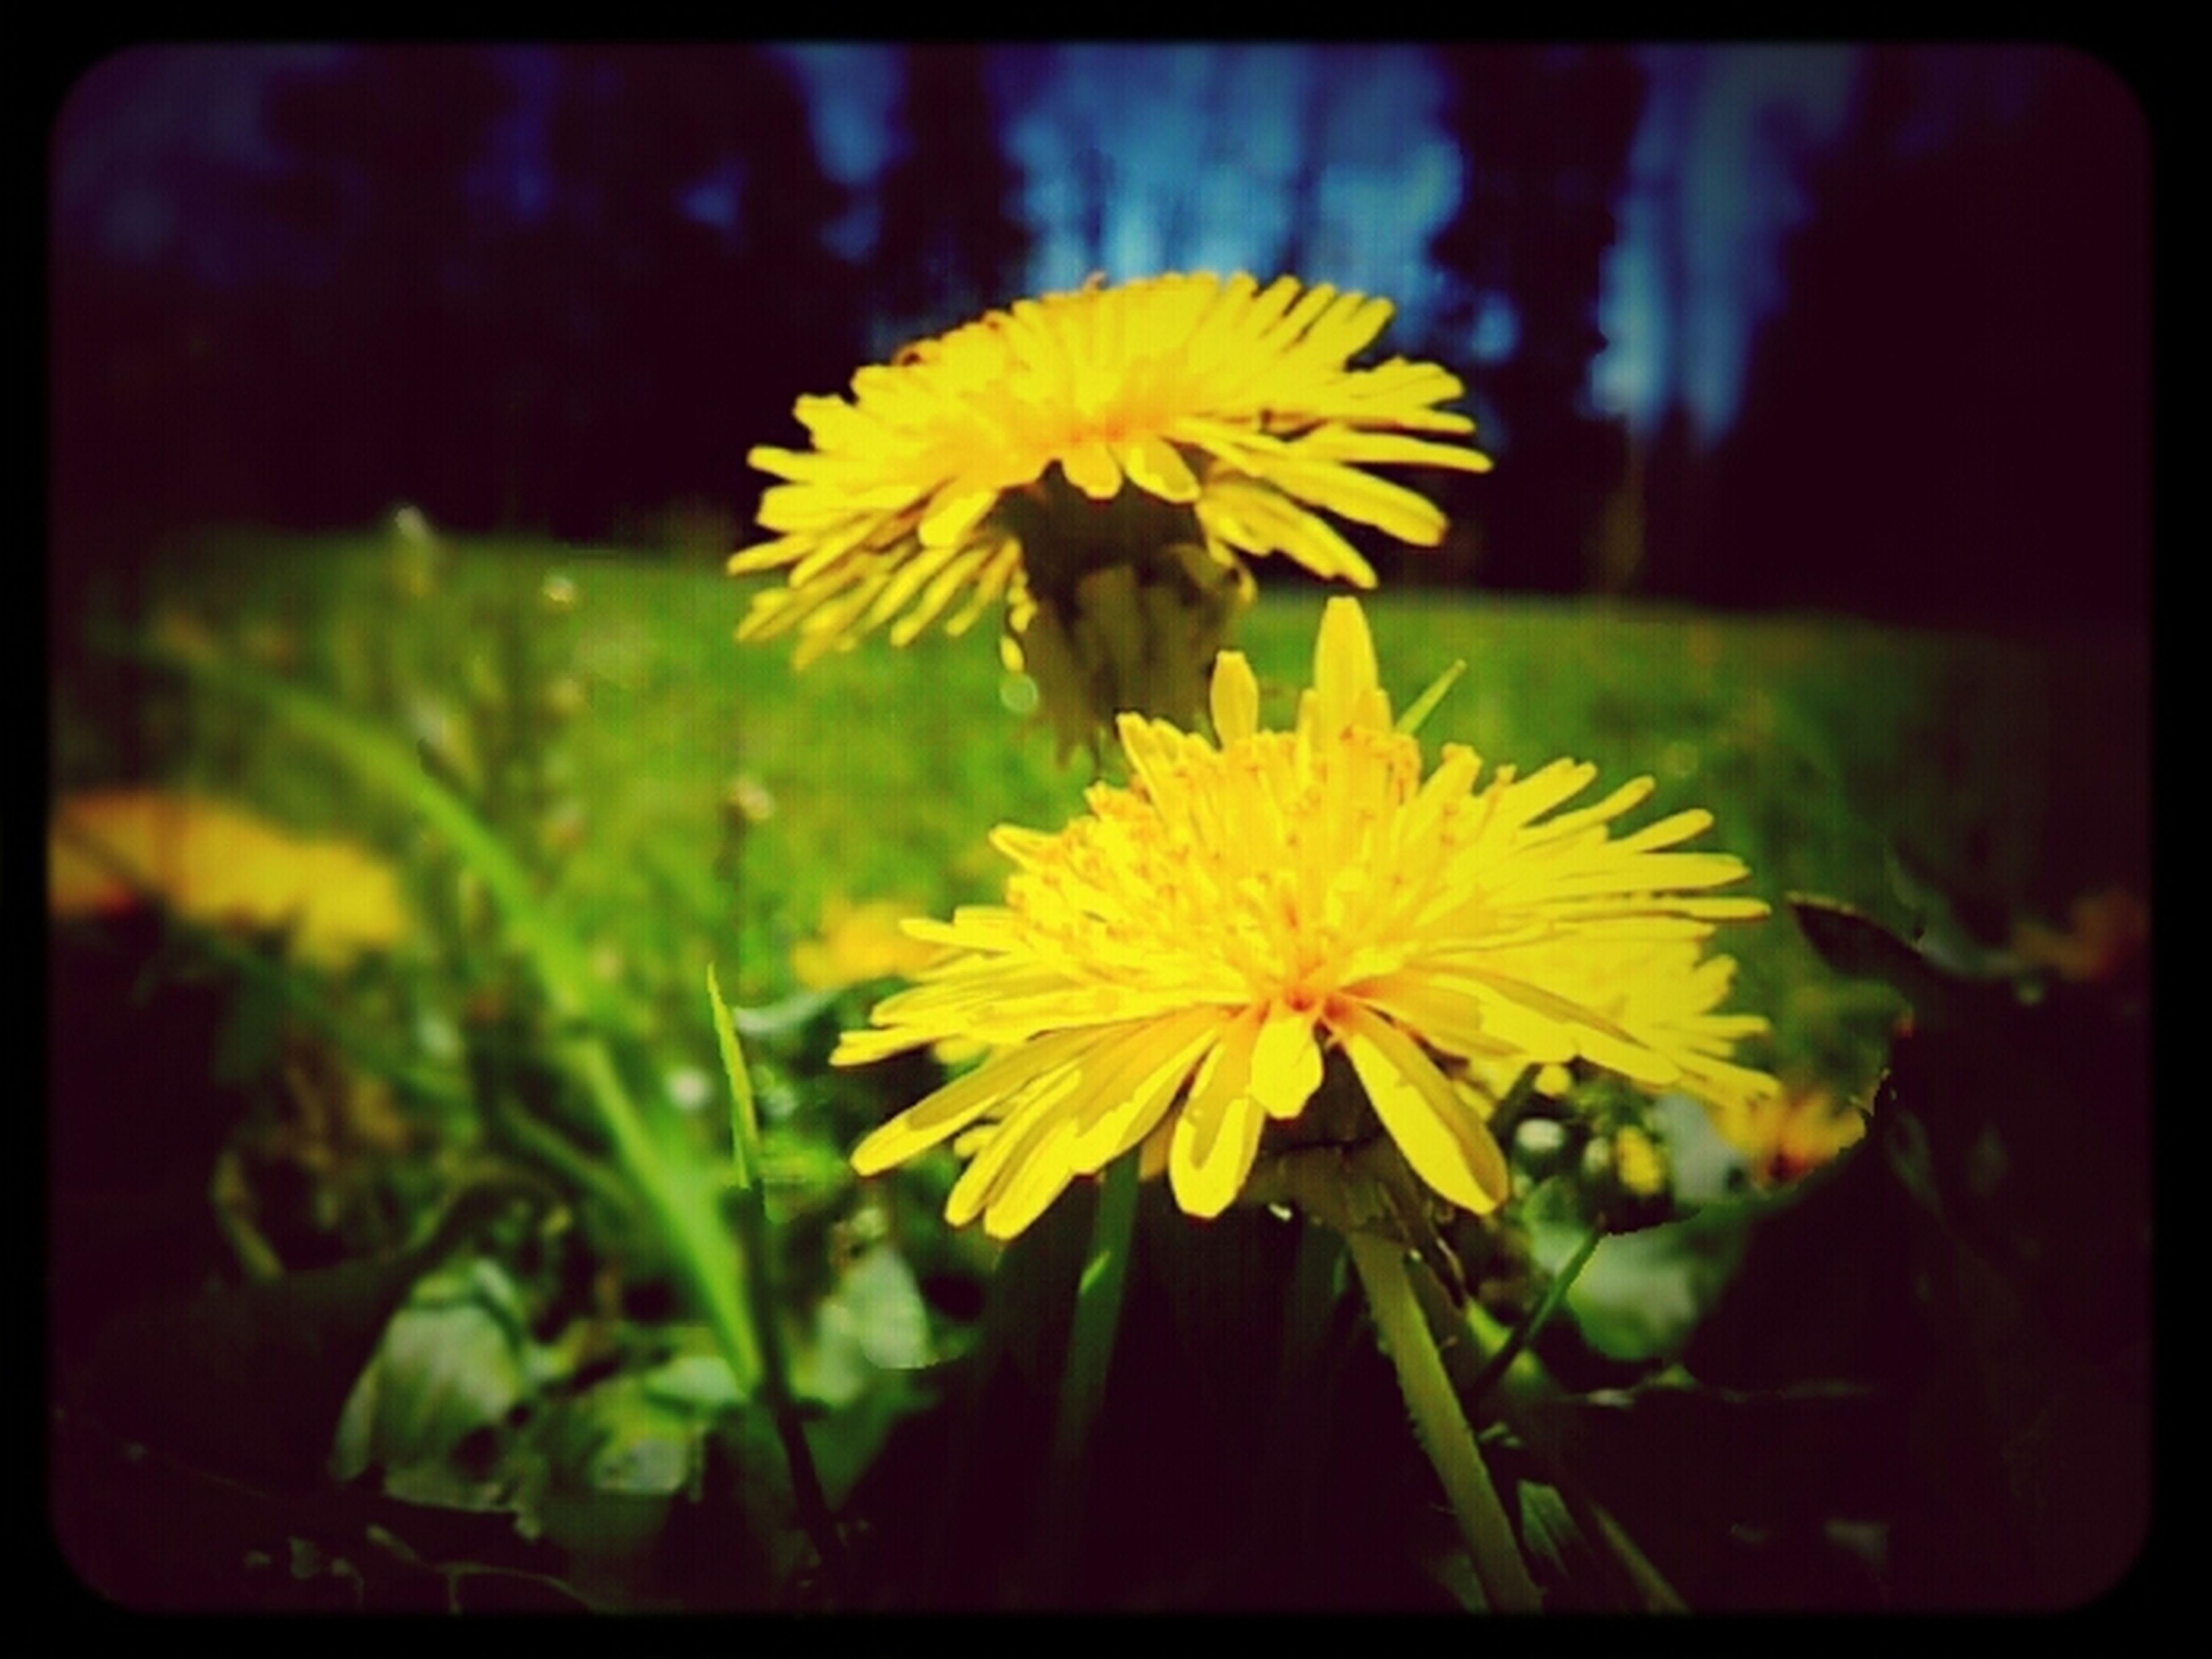 Summer Yellow Dandelions Flower Porn